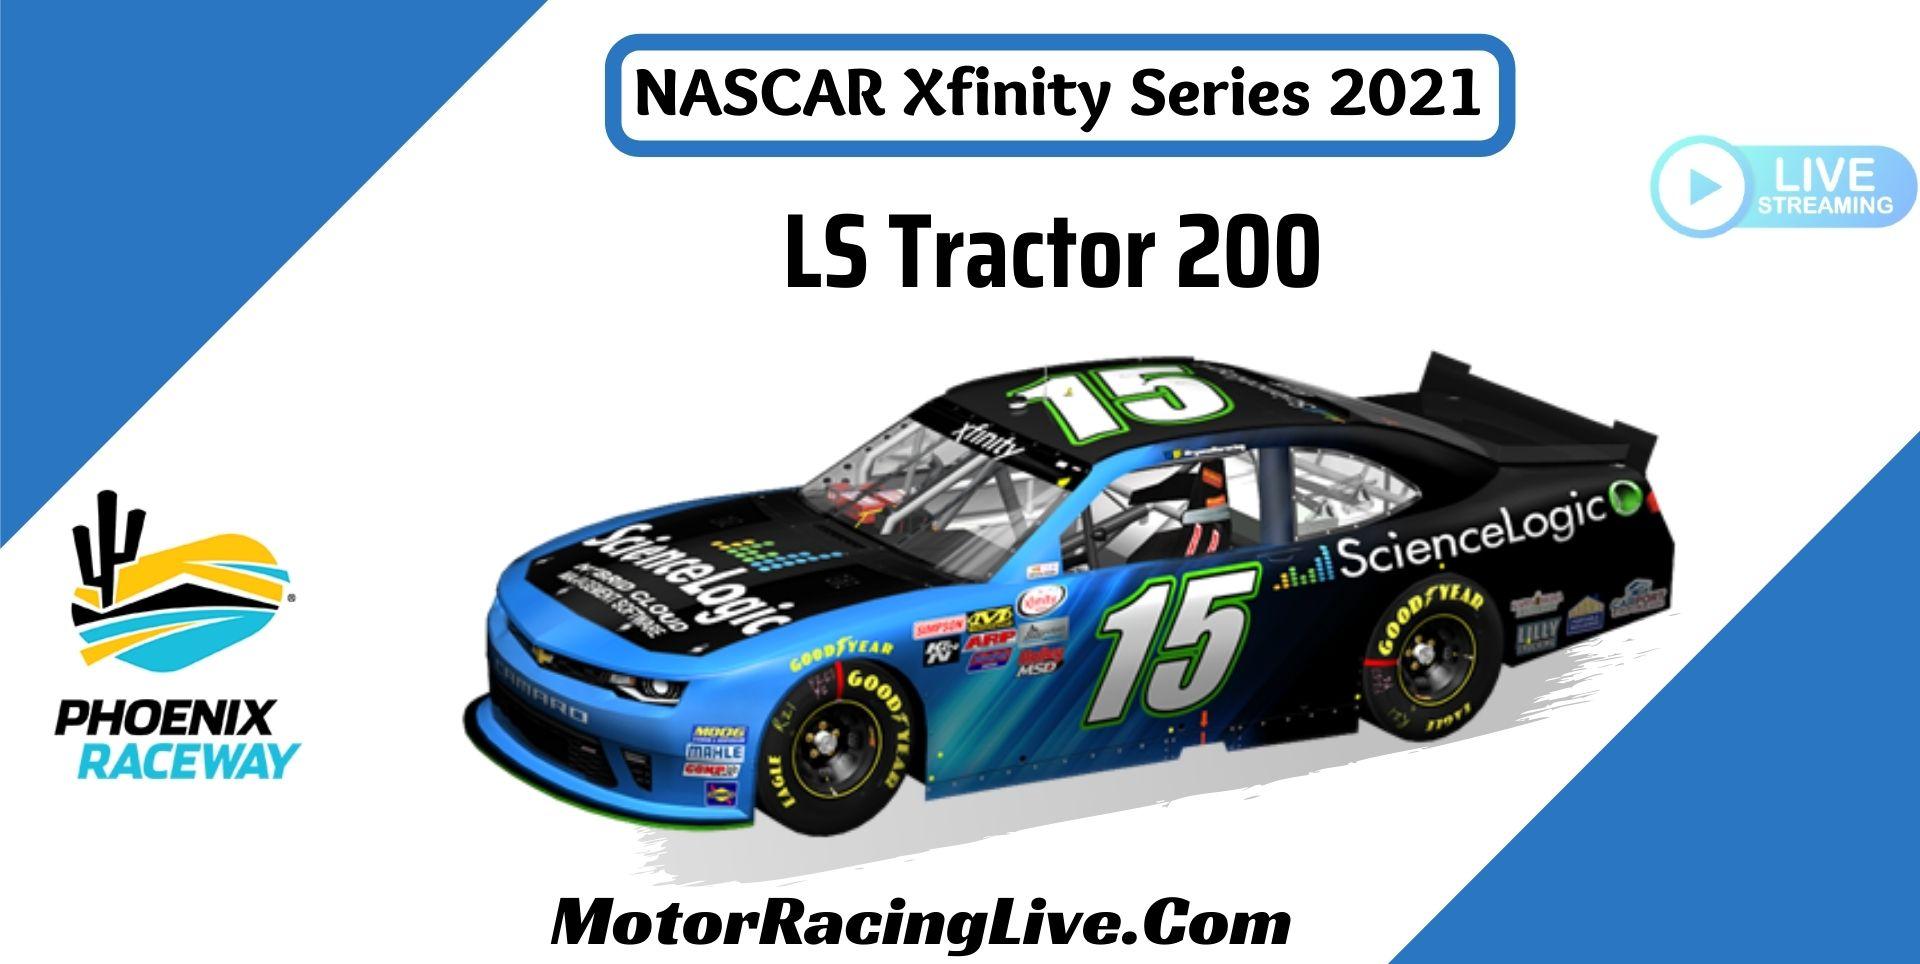 LS Tractor 200 NASCAR Xfinity 2021 Live Stream